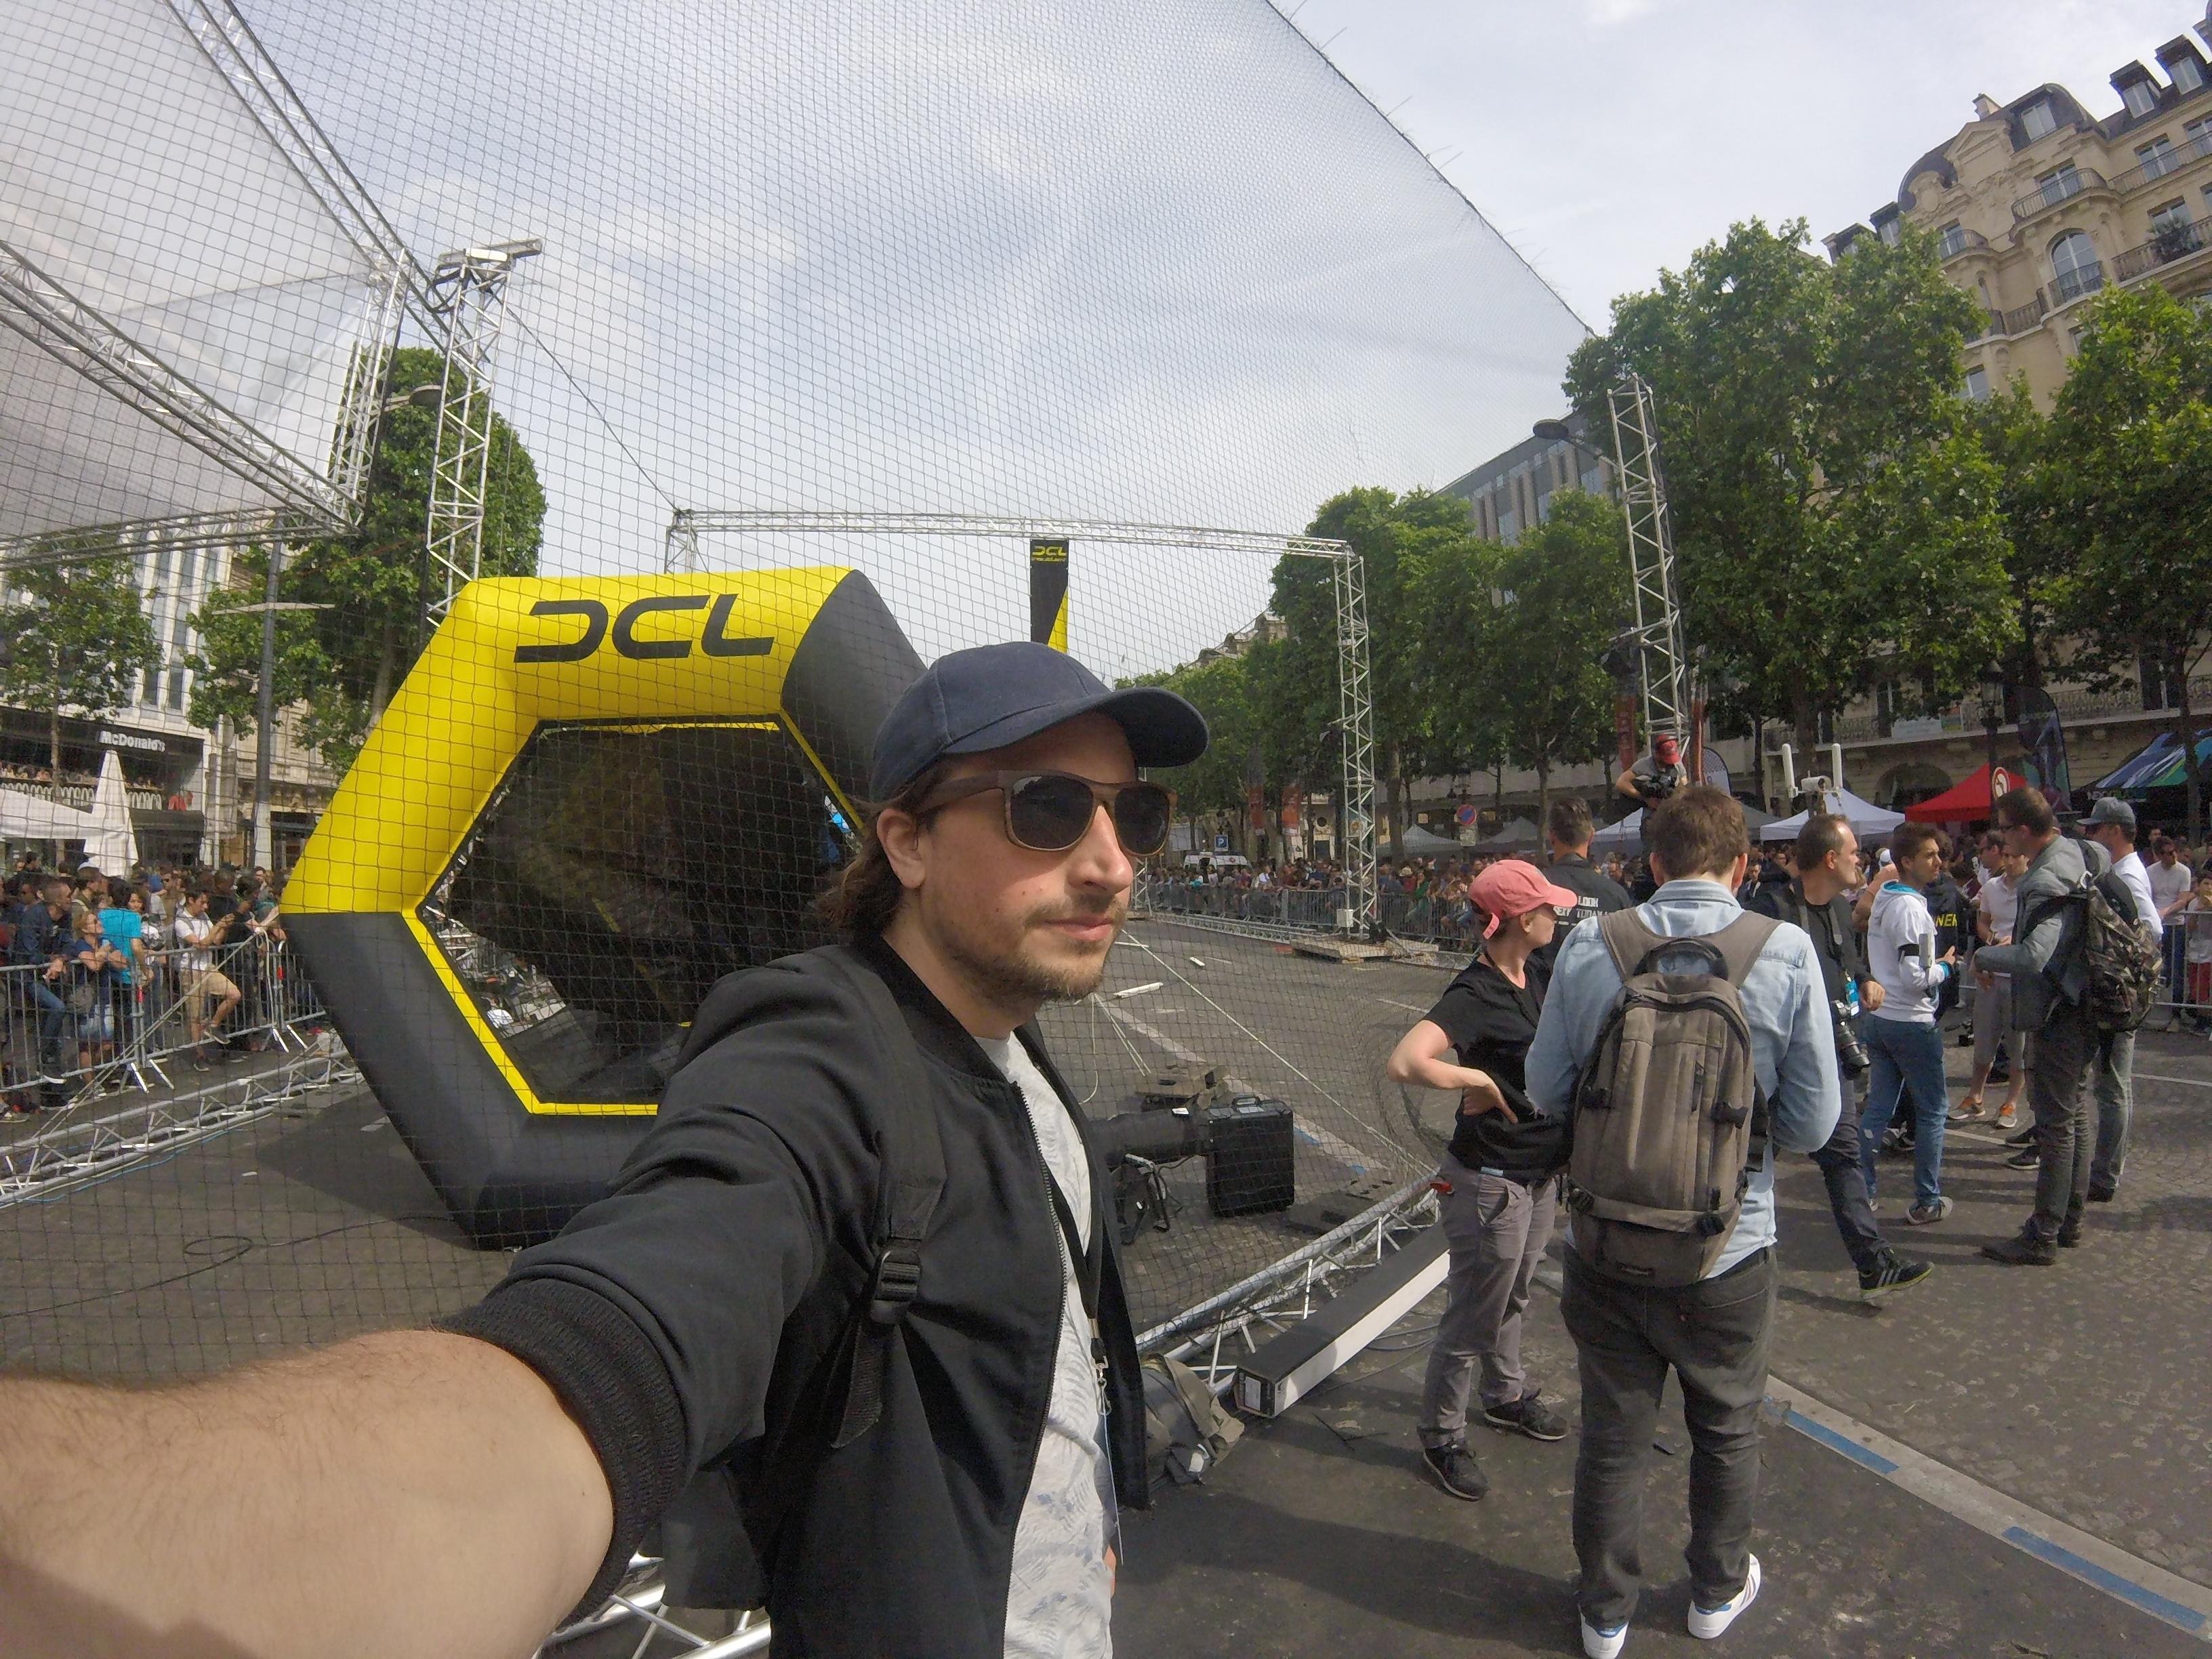 Quentin james FPV Drone